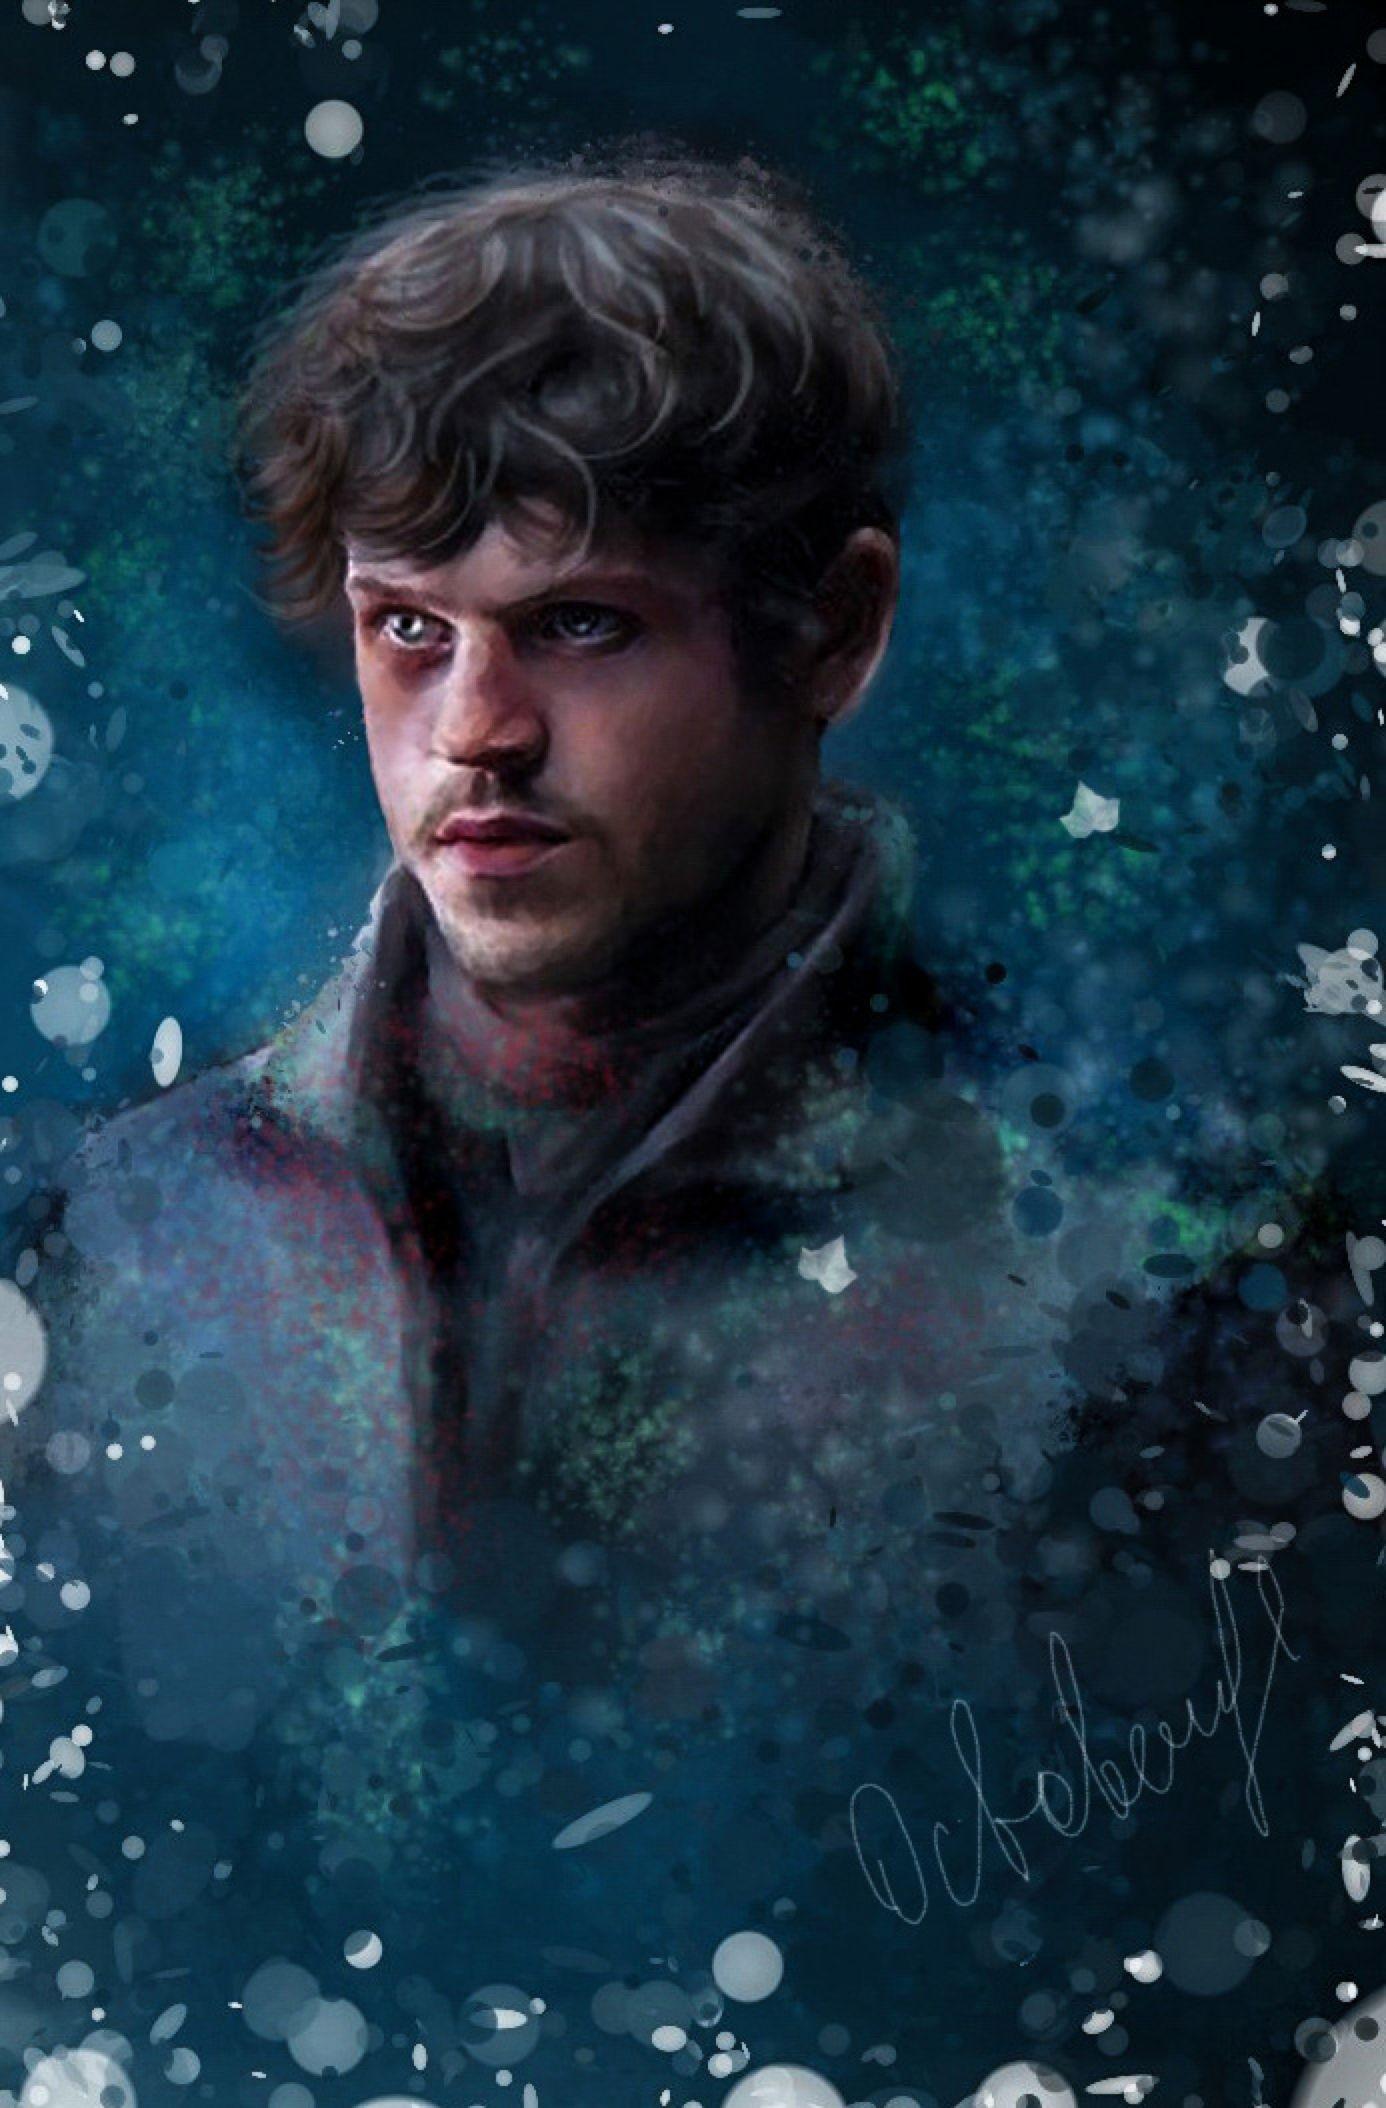 Ramsay Snow - Game of Thrones Fan Art (36773432) - Fanpop |Ramsay Snow Art